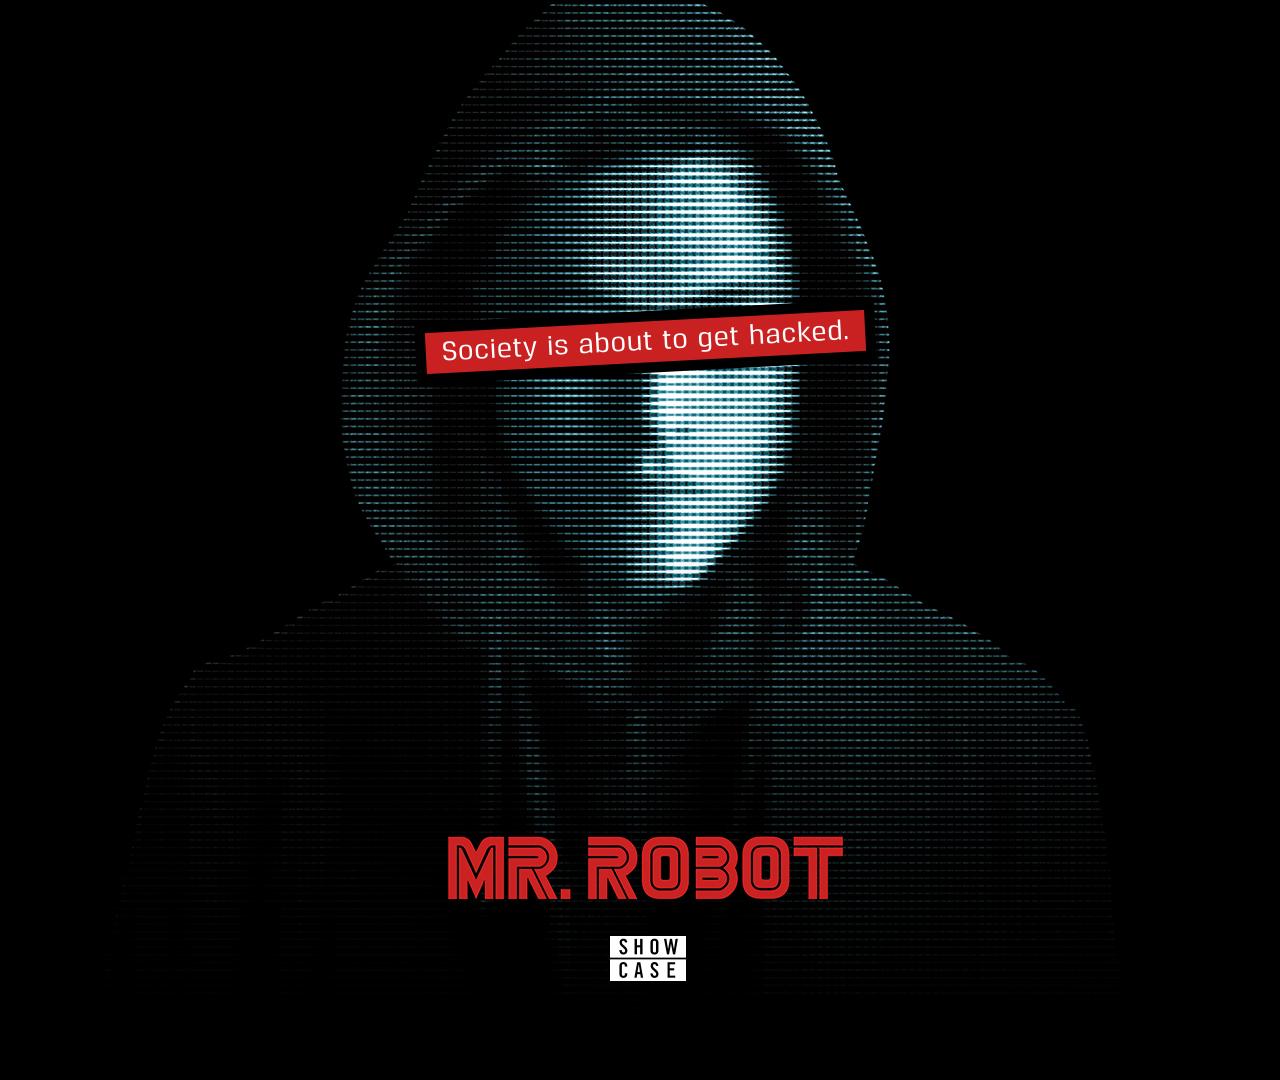 Showcase | Blog - Mr. Robot digital wallpaper & Mr.Robot ...